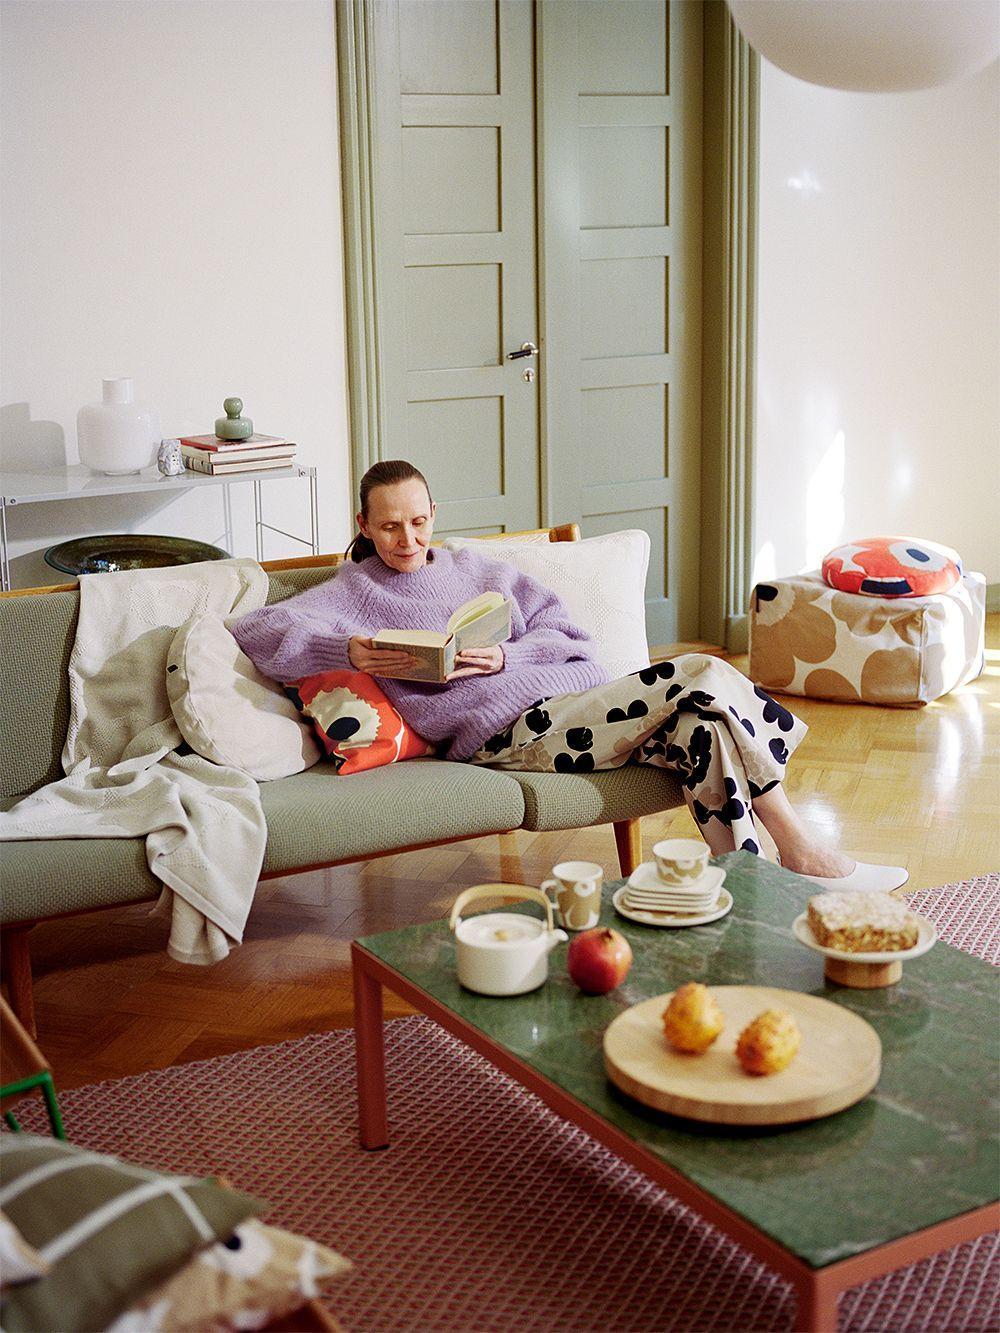 Marimekko's Unikko cushion covers in a living room.